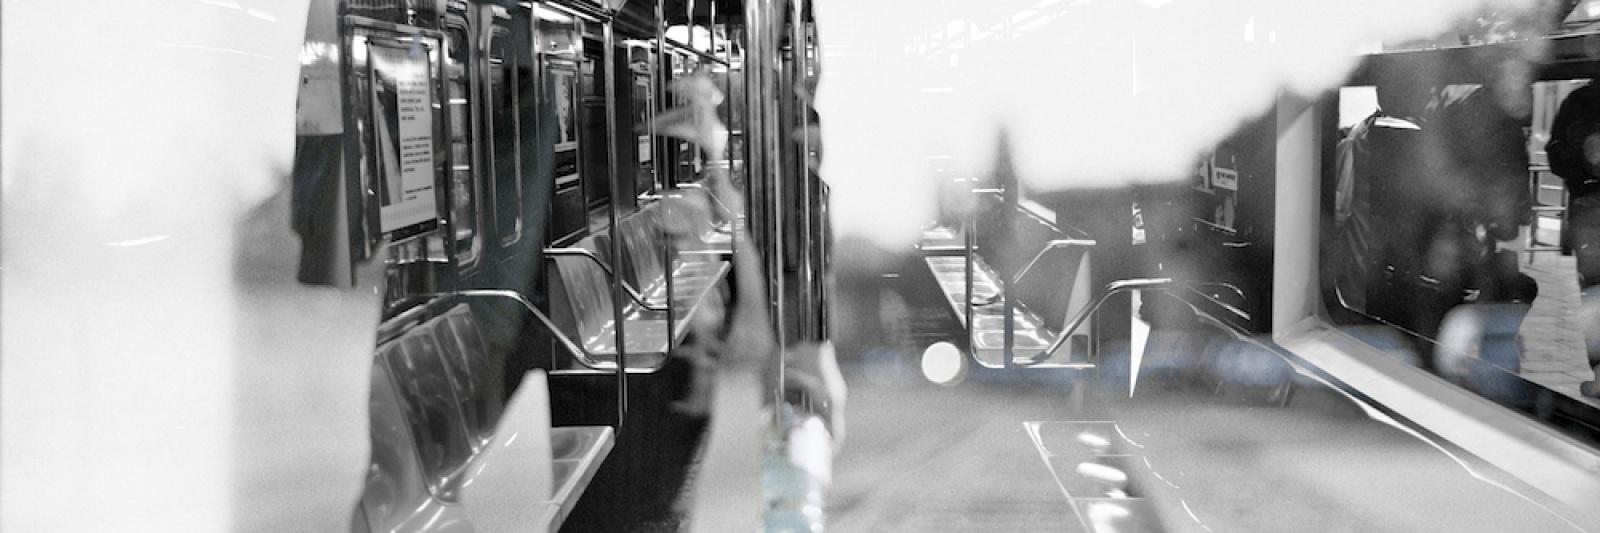 Joker's Train - 2012